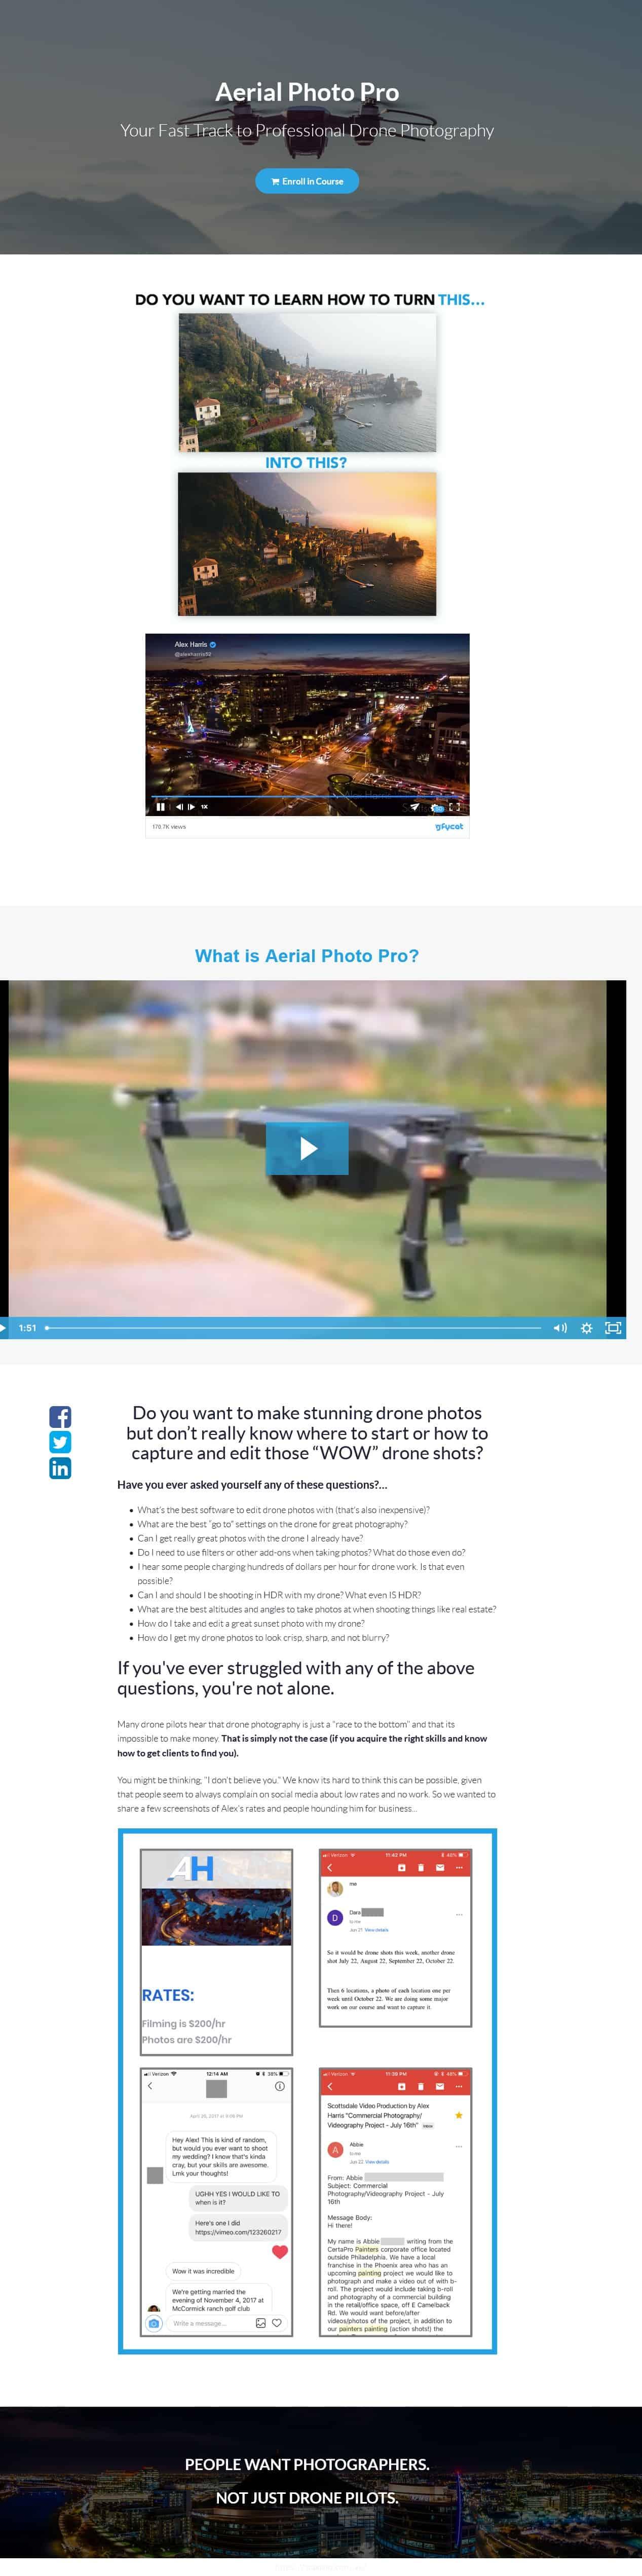 Drone Launch Academy Bundle Sales Page